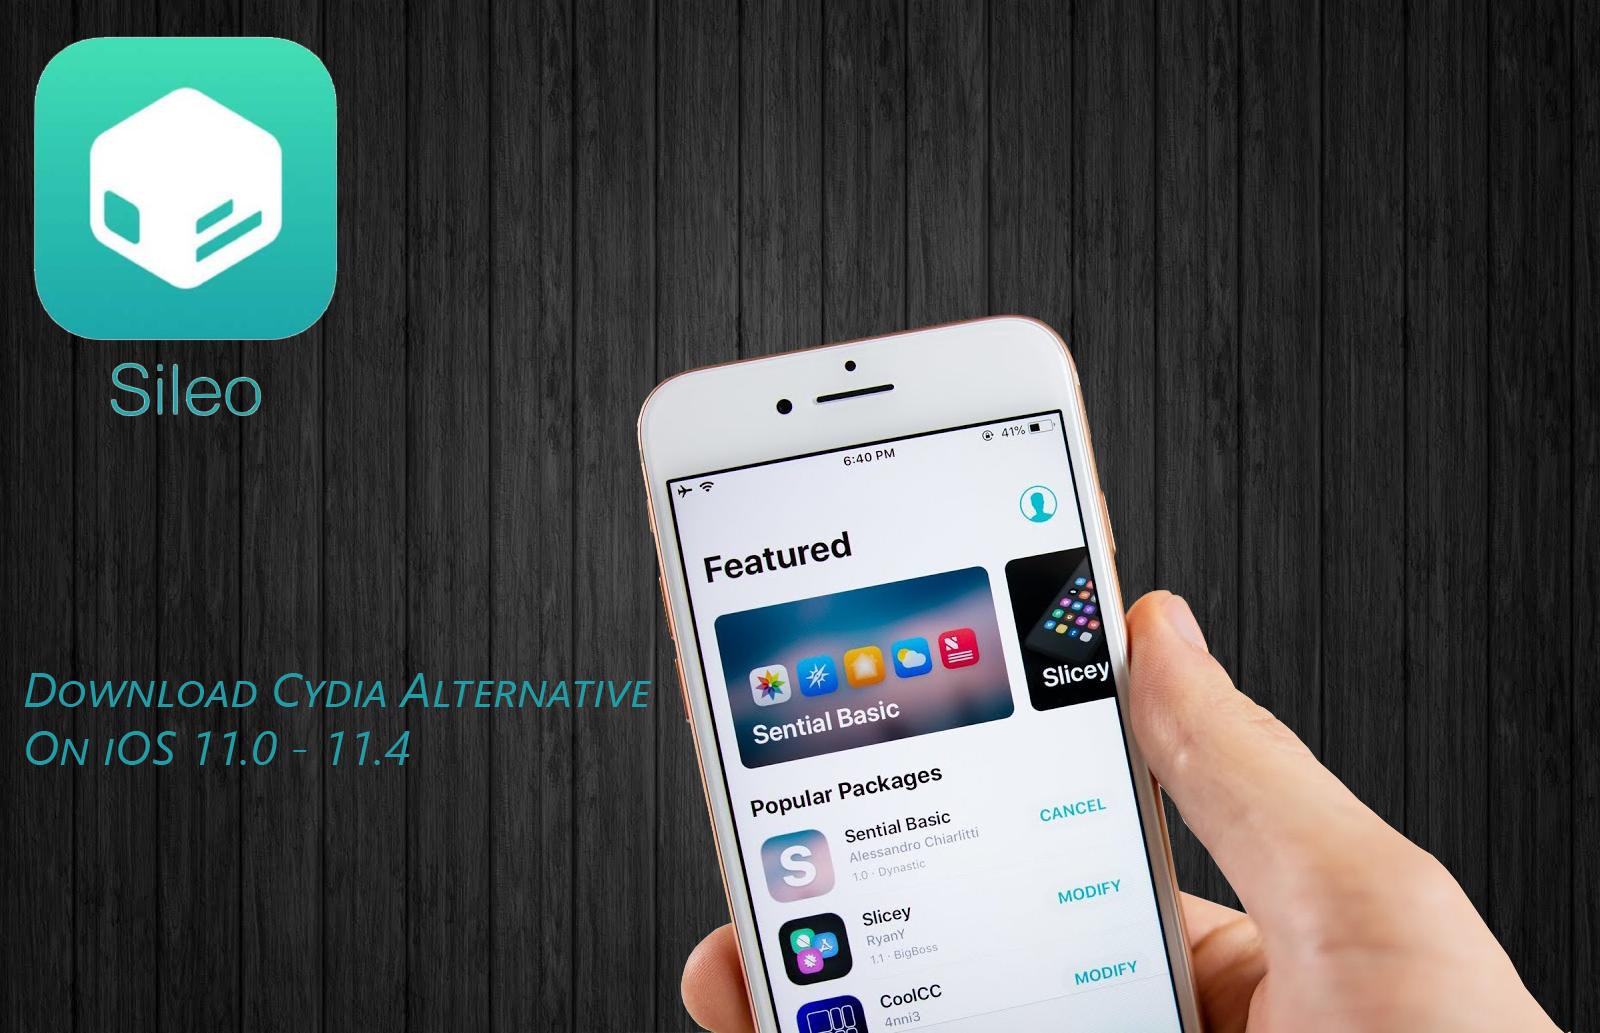 Download Sileo amazing Cydia alternative on your iOS 11 0